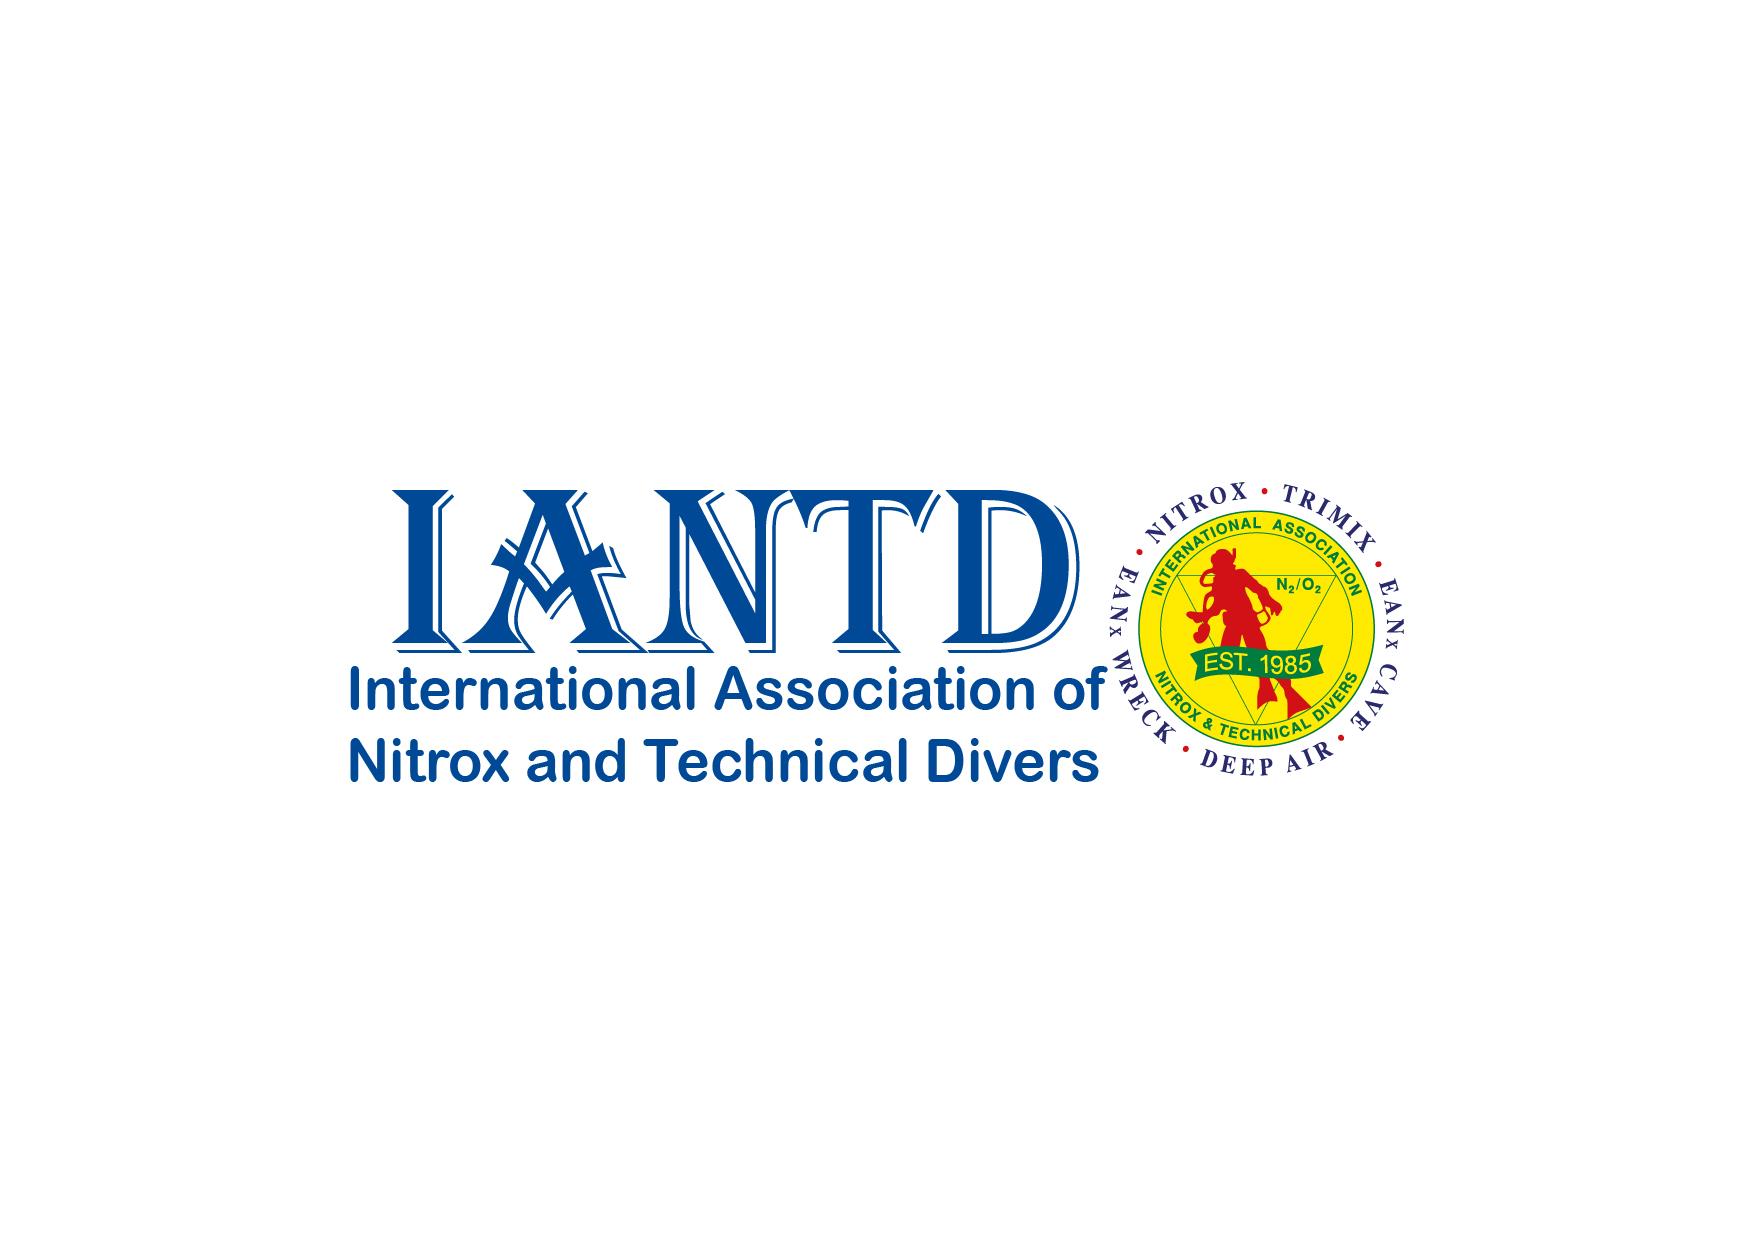 Logo IANTD Horizontal St 1985-01